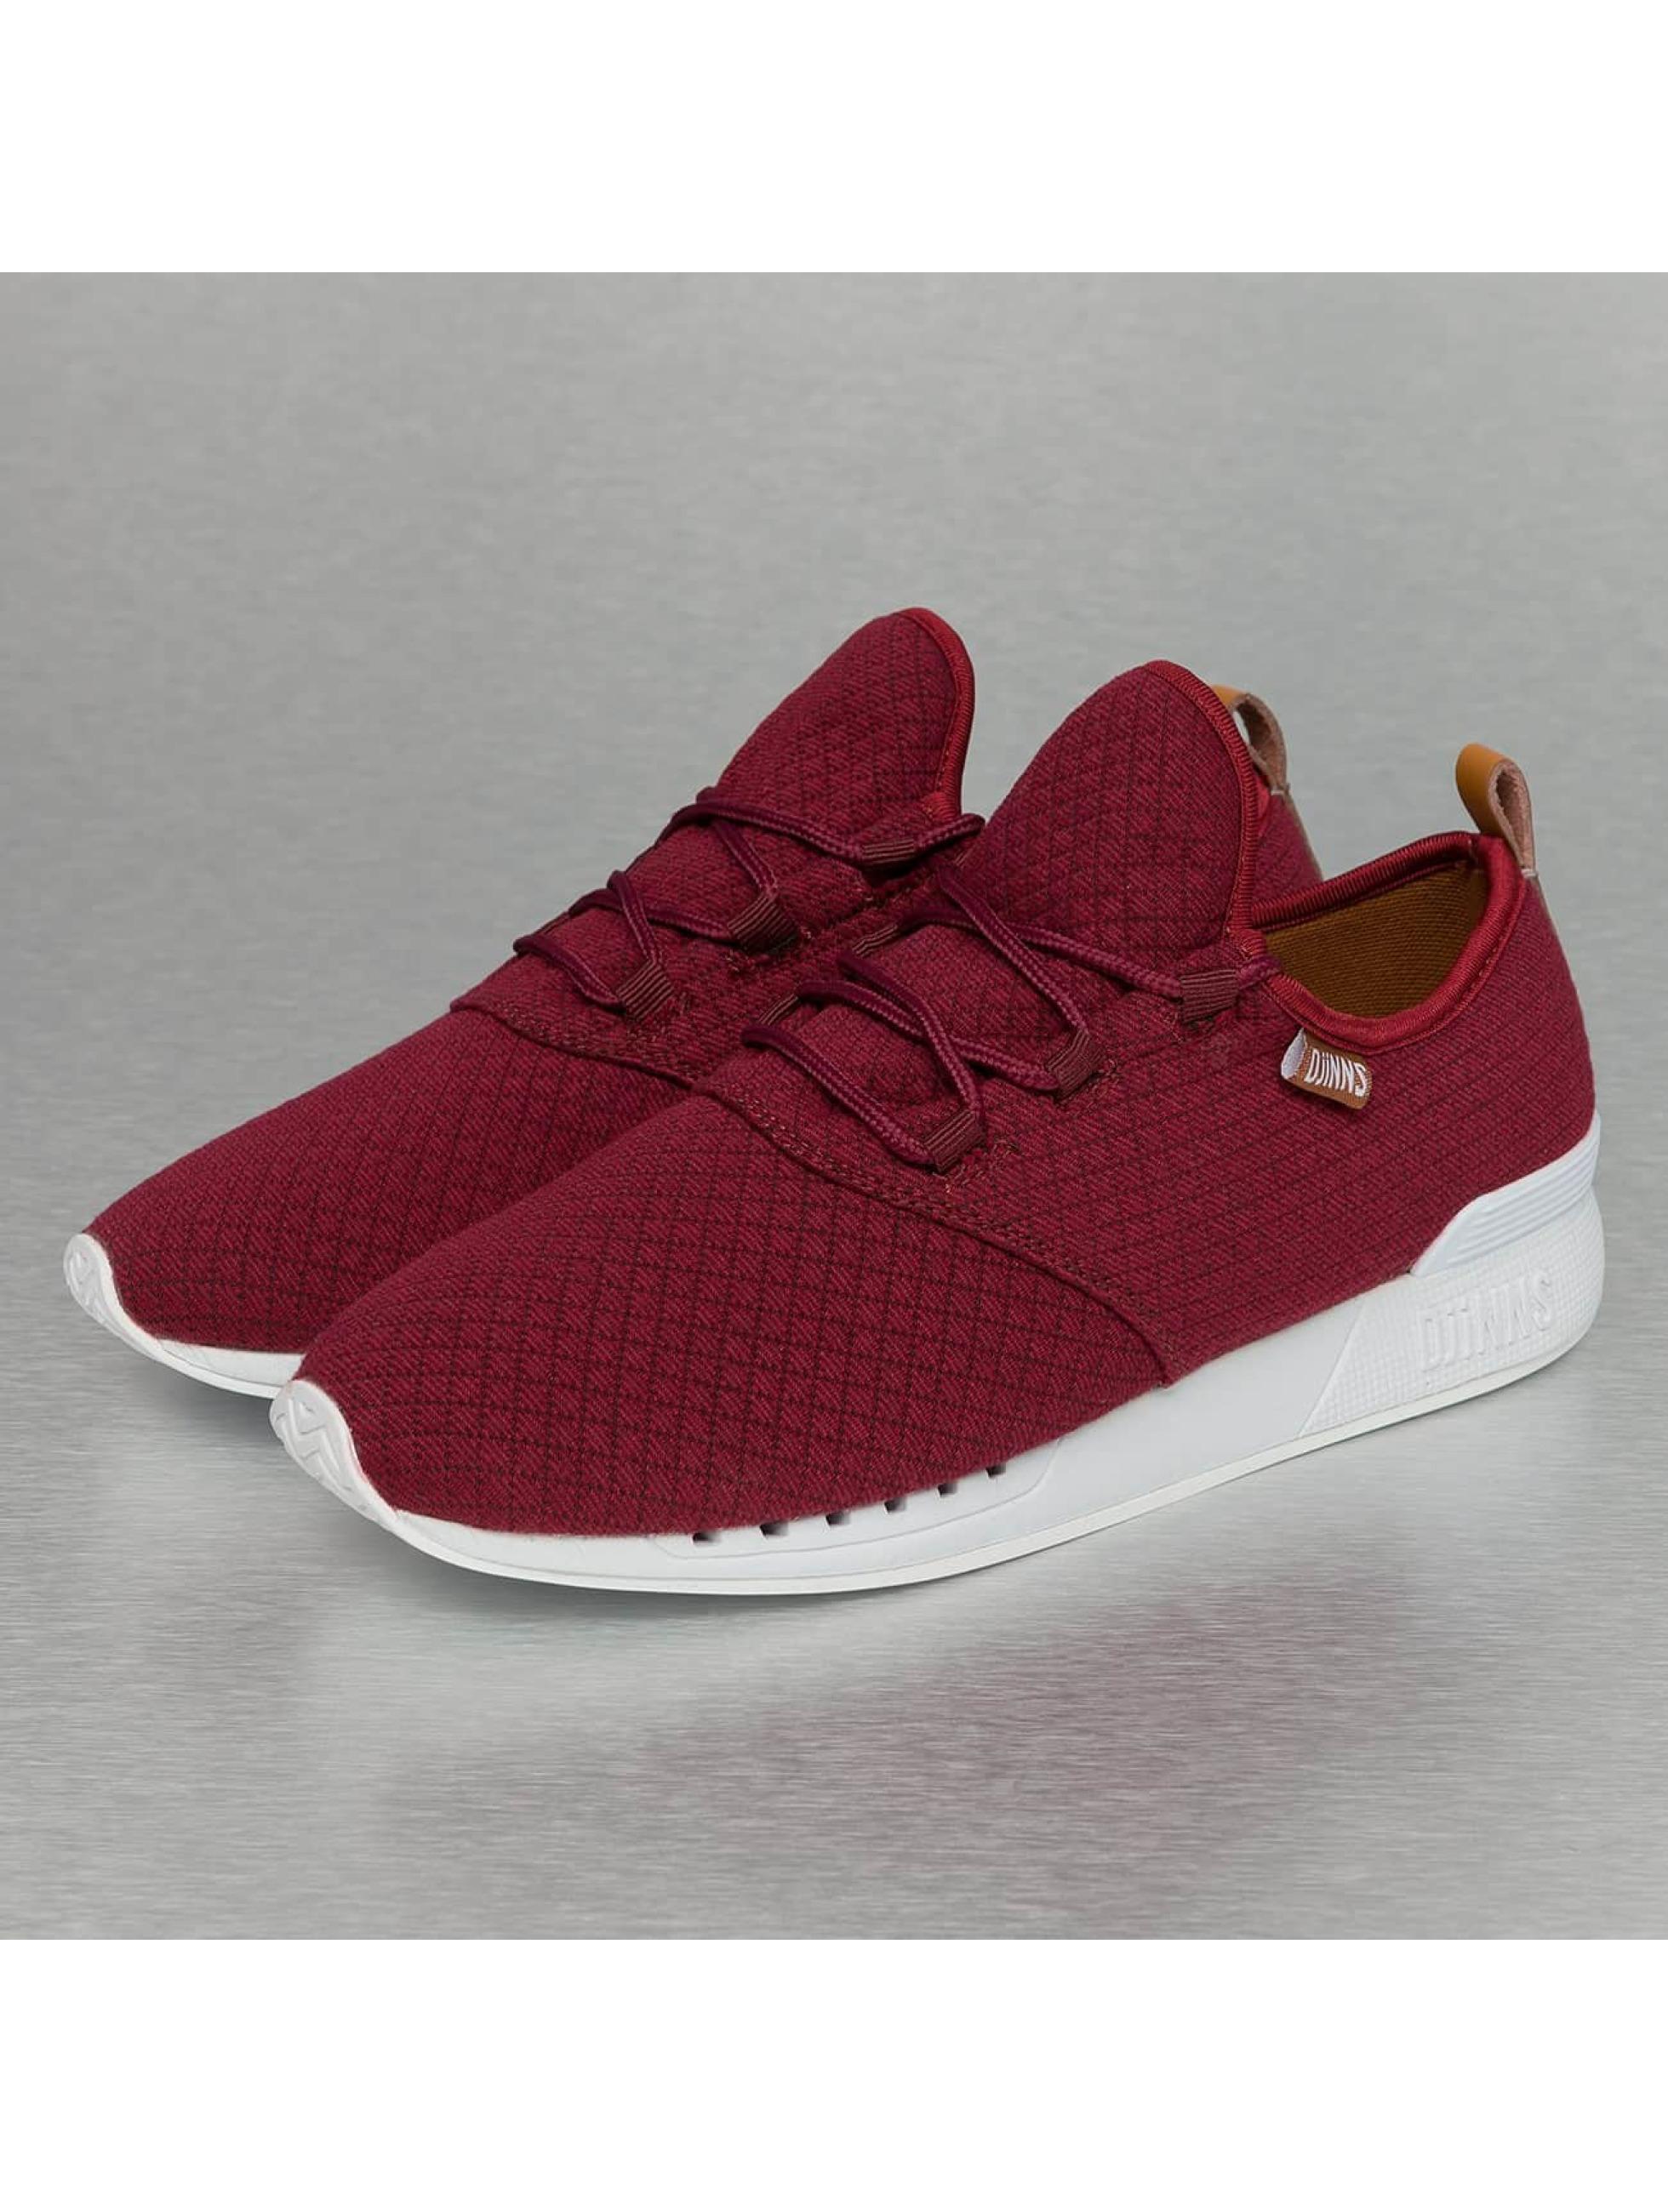 Djinns Sneakers Moc Lau Mini Padded red